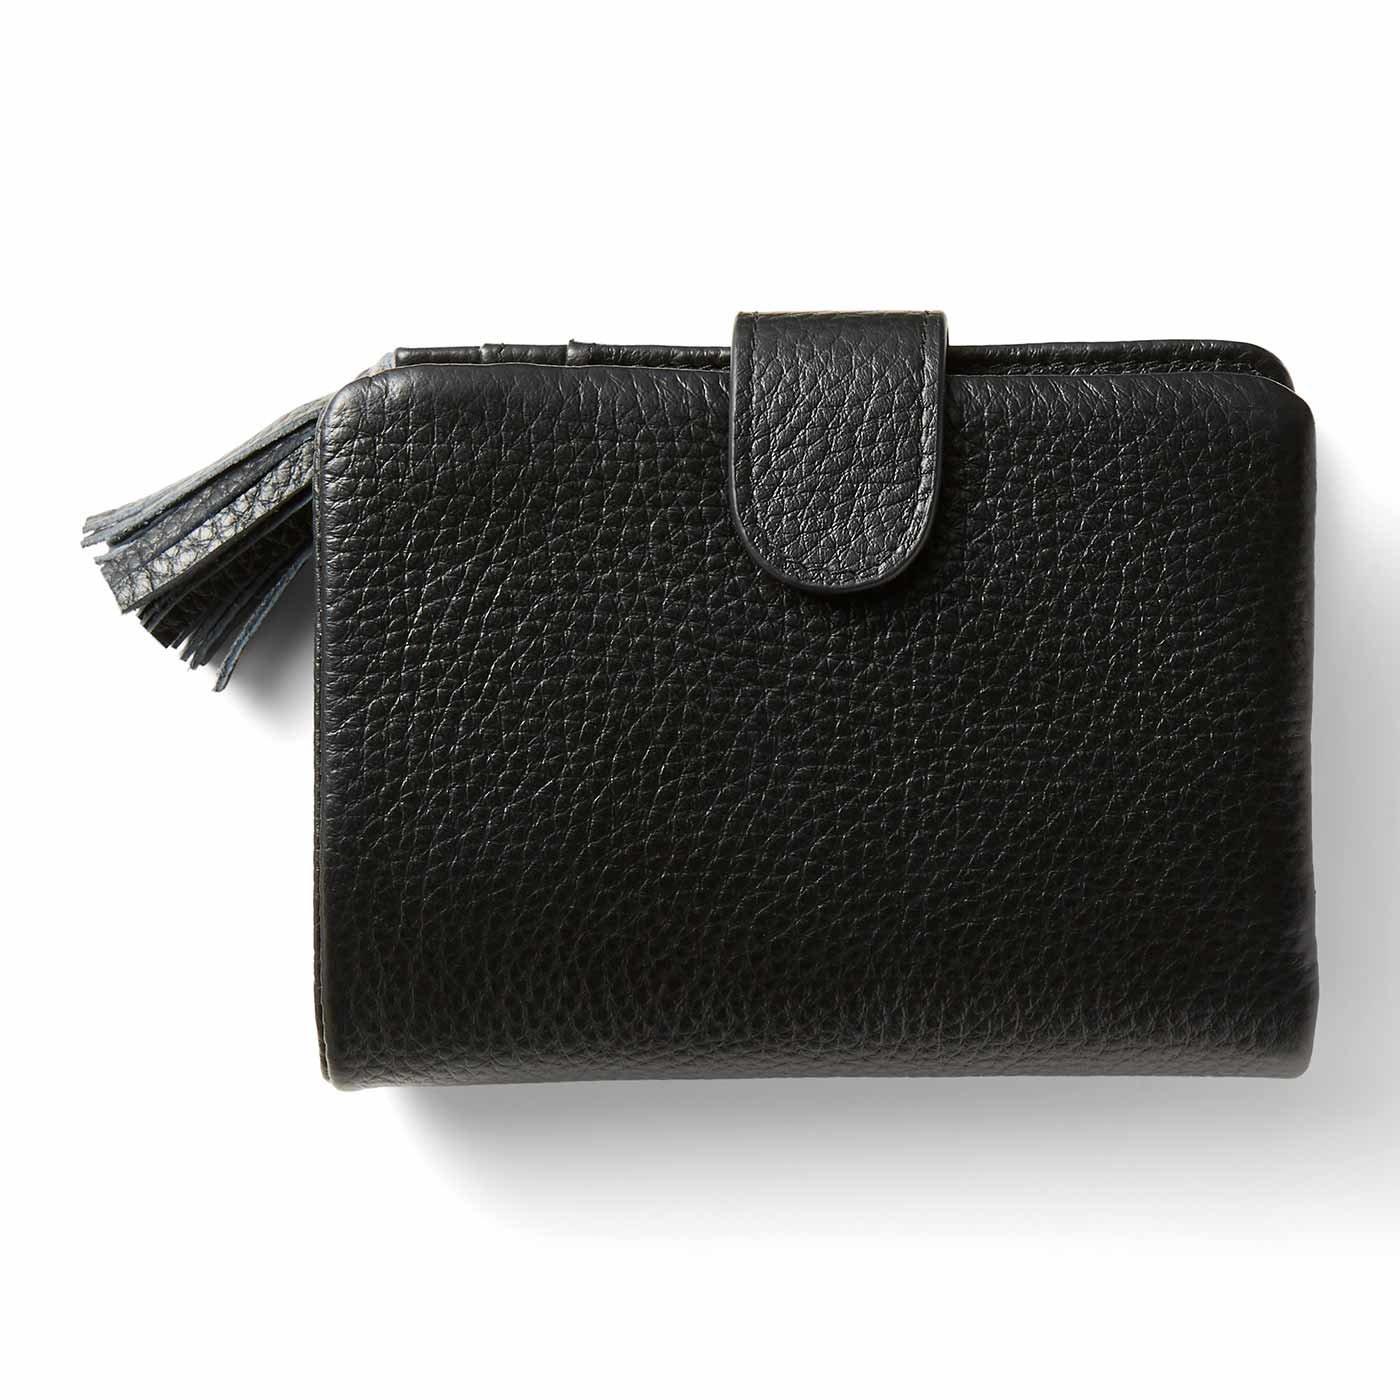 IEDIT[イディット] くったり本革素材できれいめ二つ折り財布〈ブラック〉